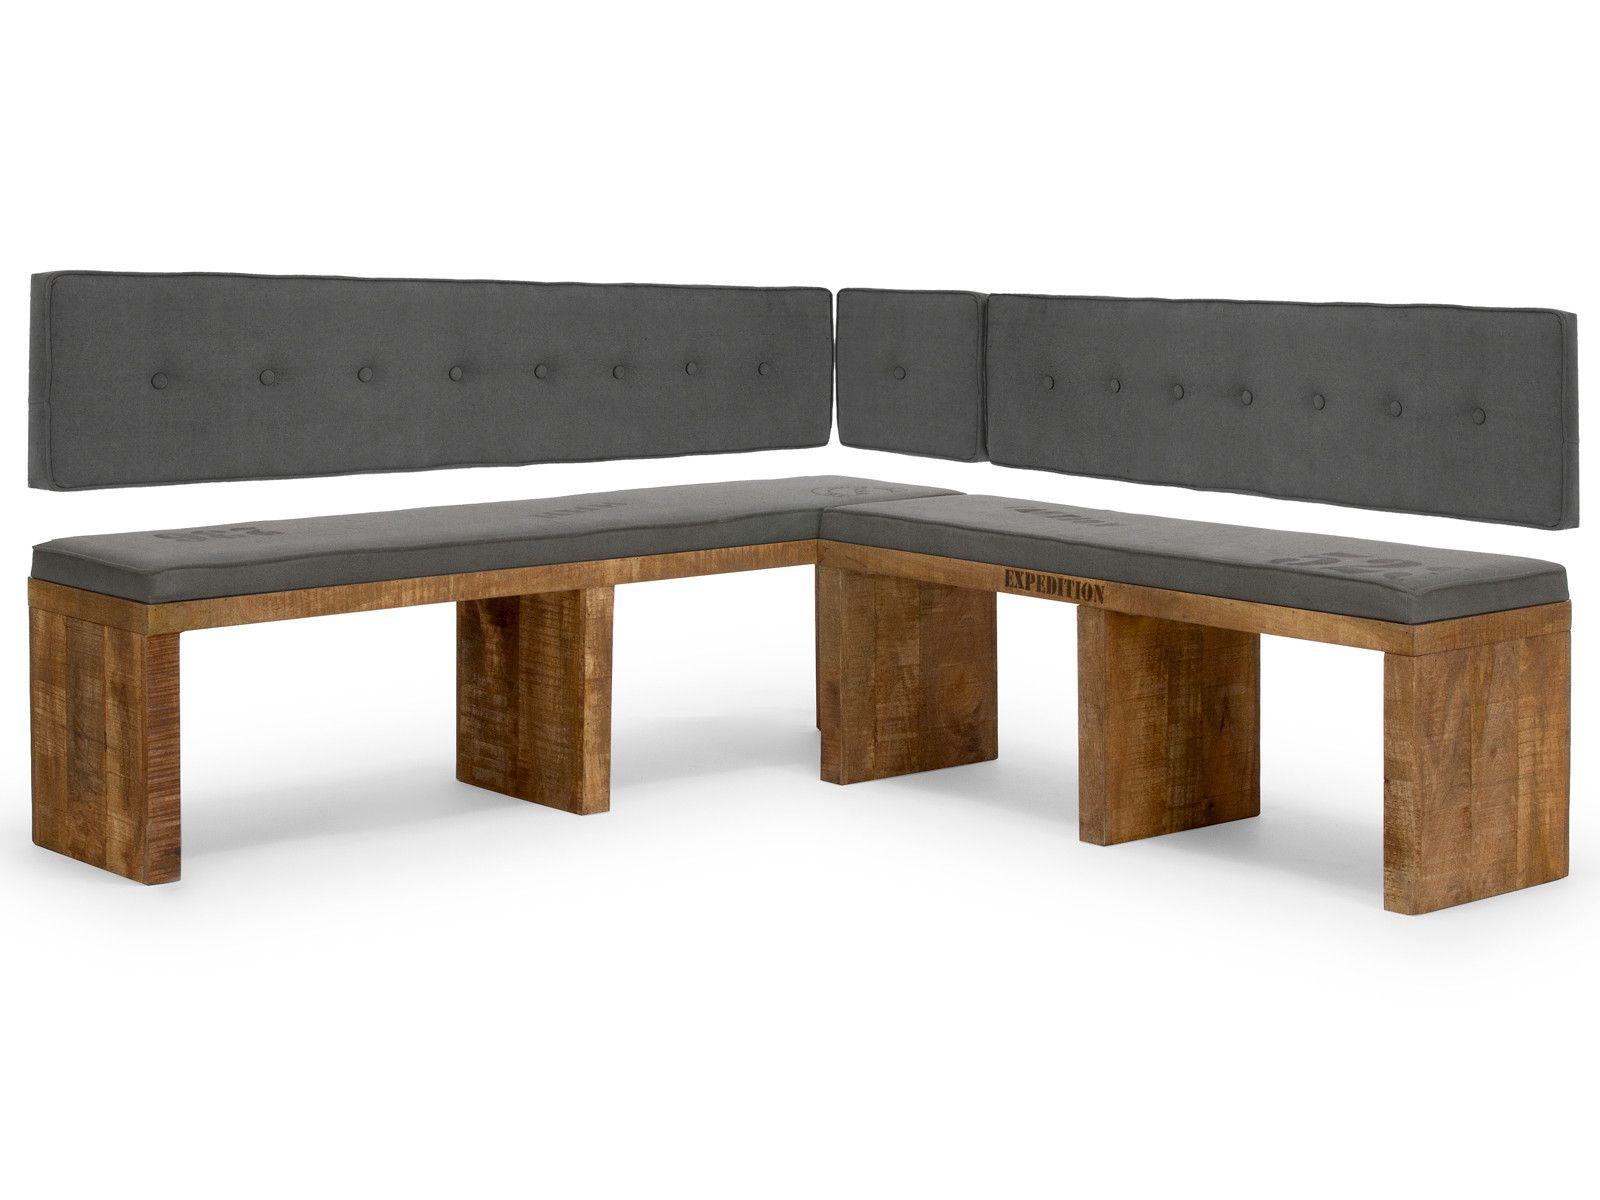 Full Size of Sitzbank Küche Landhausstil Schmale Sitzbank Küche Sitzbank Küche Gepolstert Ikea Hack Sitzbank Küche Küche Sitzbank Küche